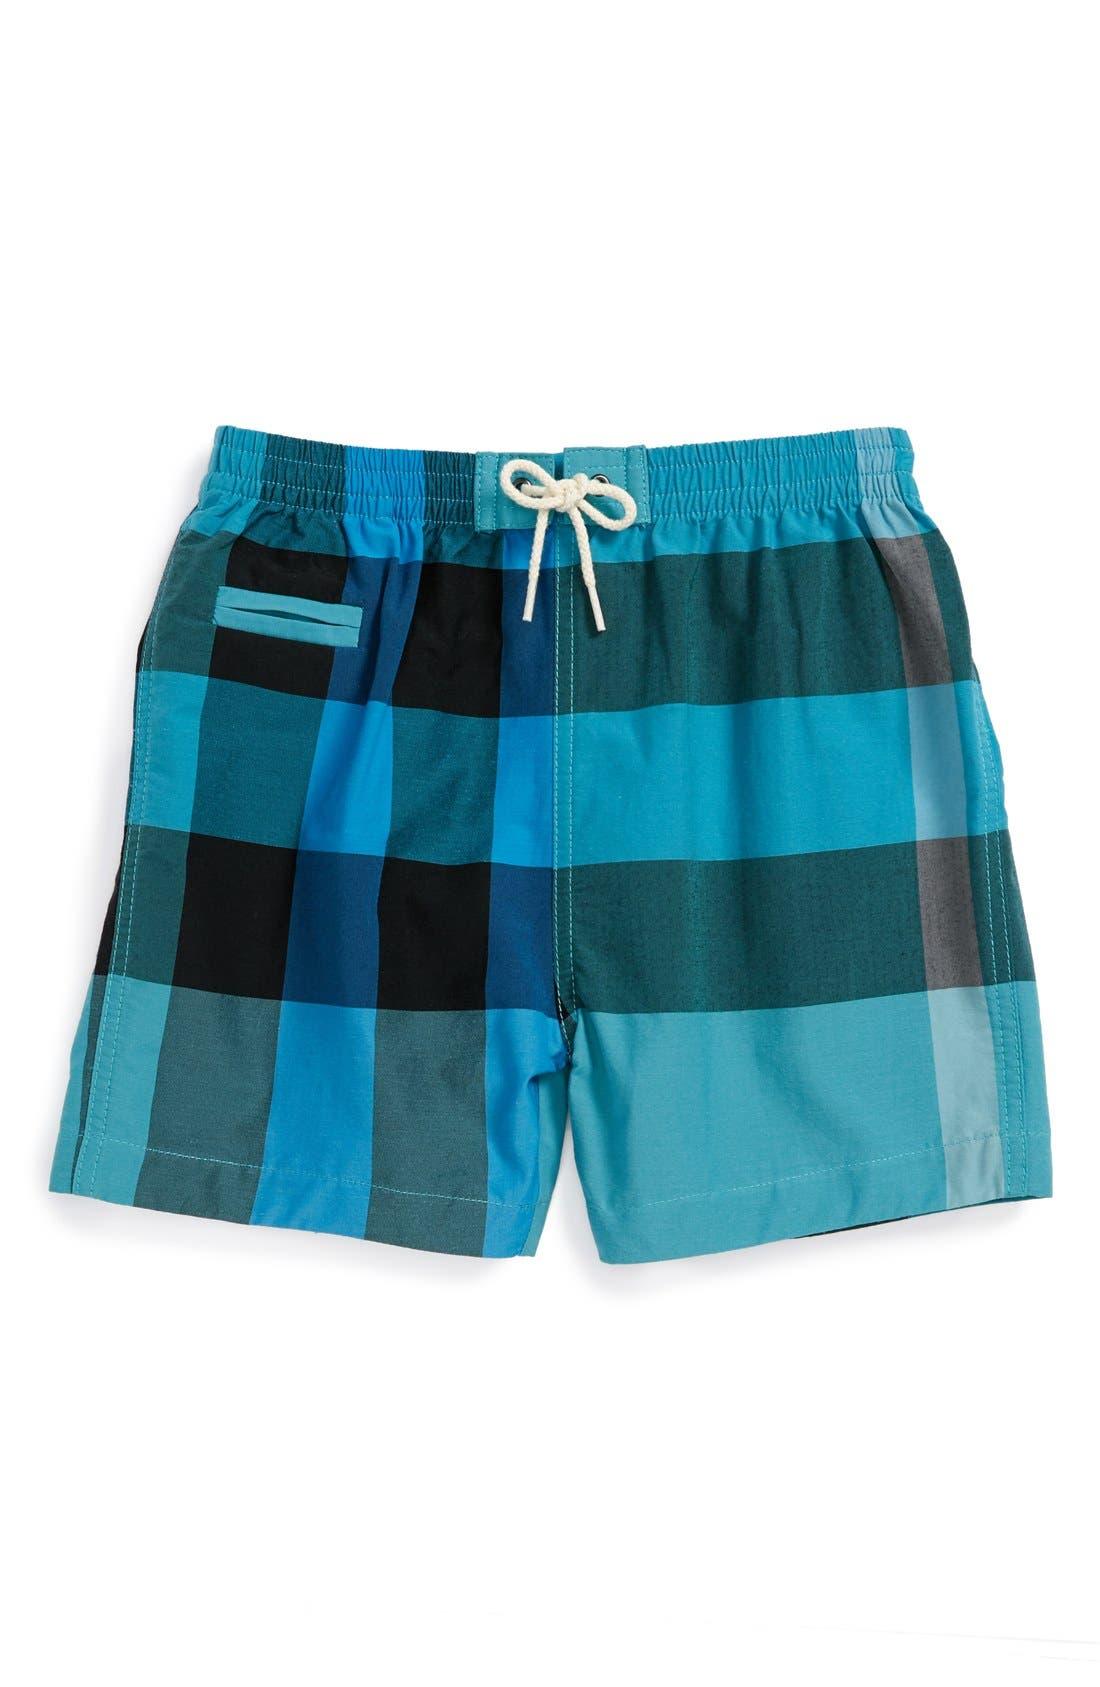 Alternate Image 1 Selected - Burberry Check Print Swim Shorts (Baby Boys)